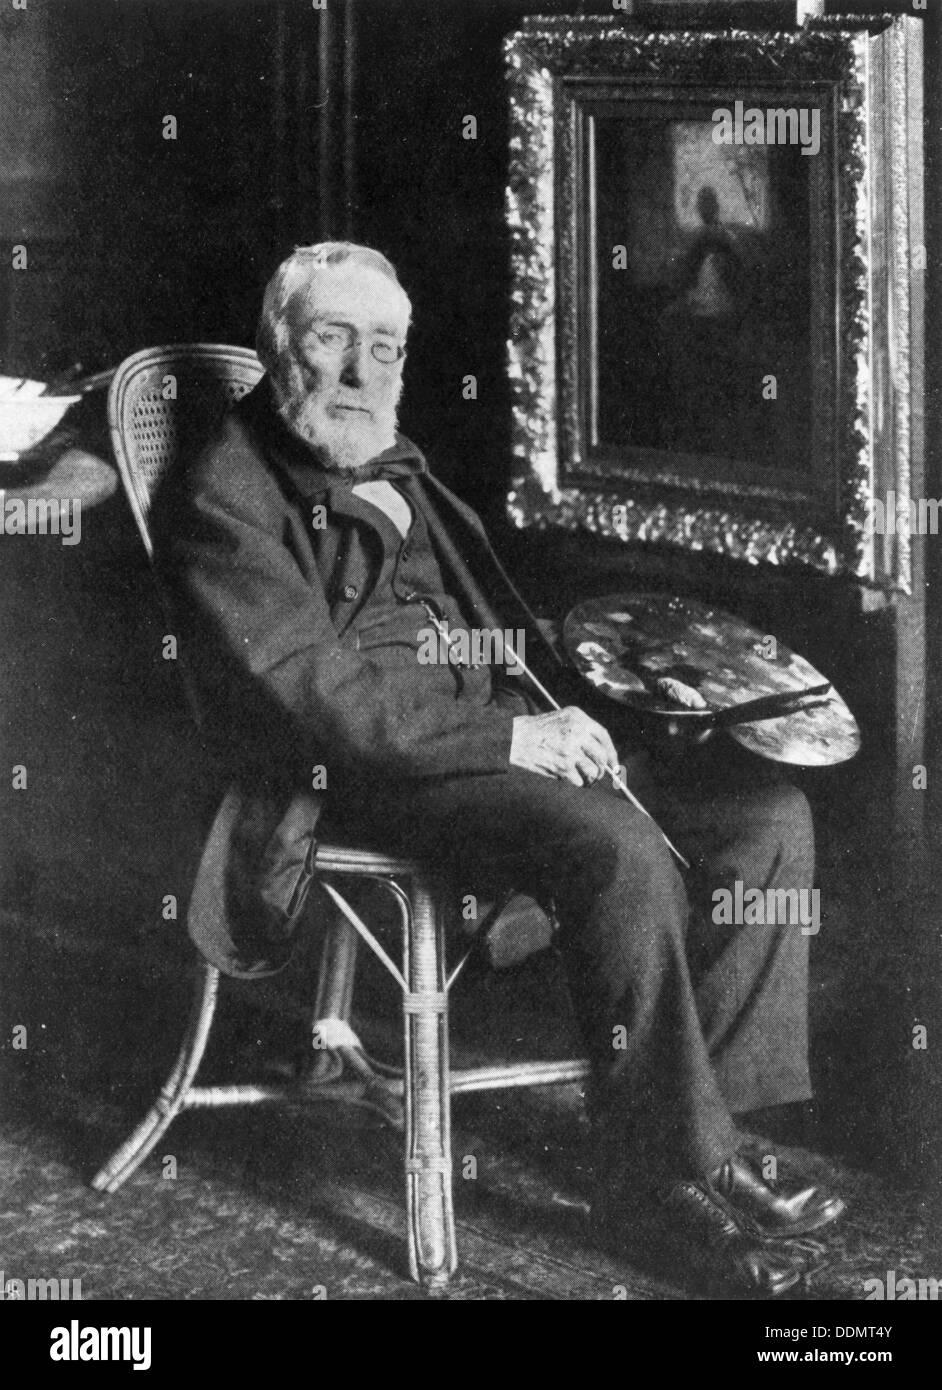 Jozef Israels (1824-1911), Dutch painter, in his studio. - Stock Image